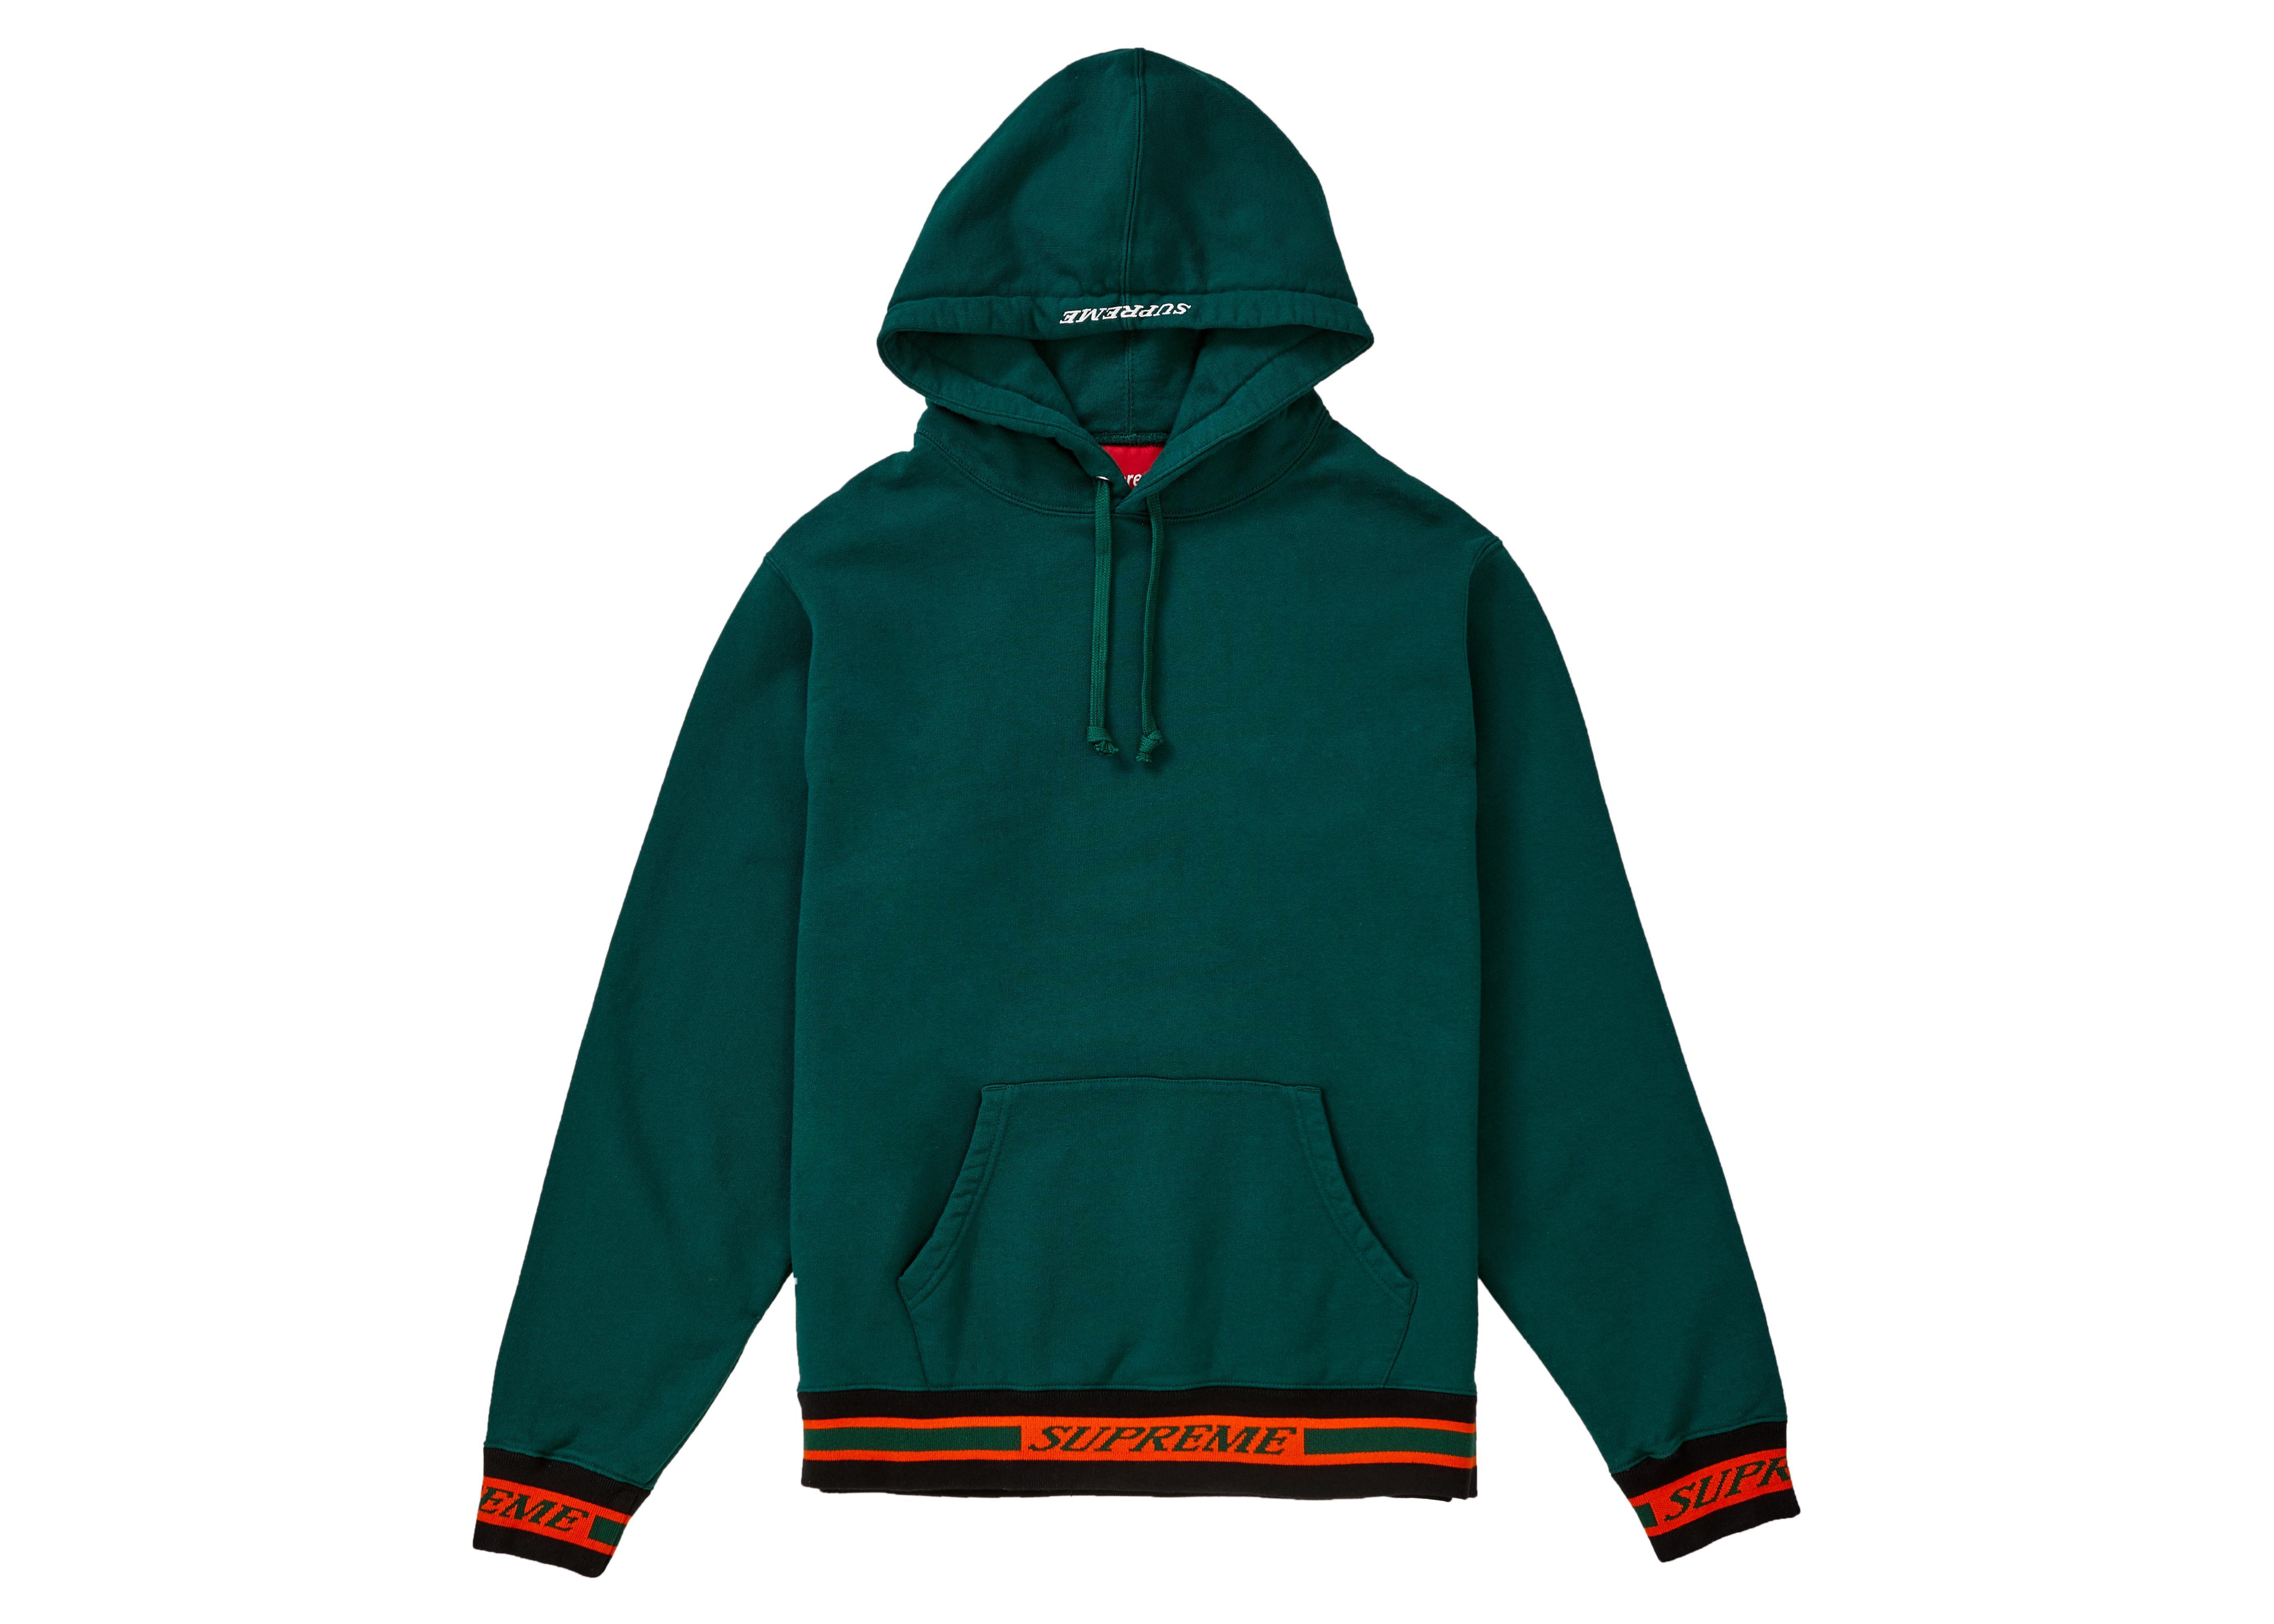 cbbf03322998 Lyst - Supreme Striped Rib Hooded Sweatshirt Dark Green in Green for Men